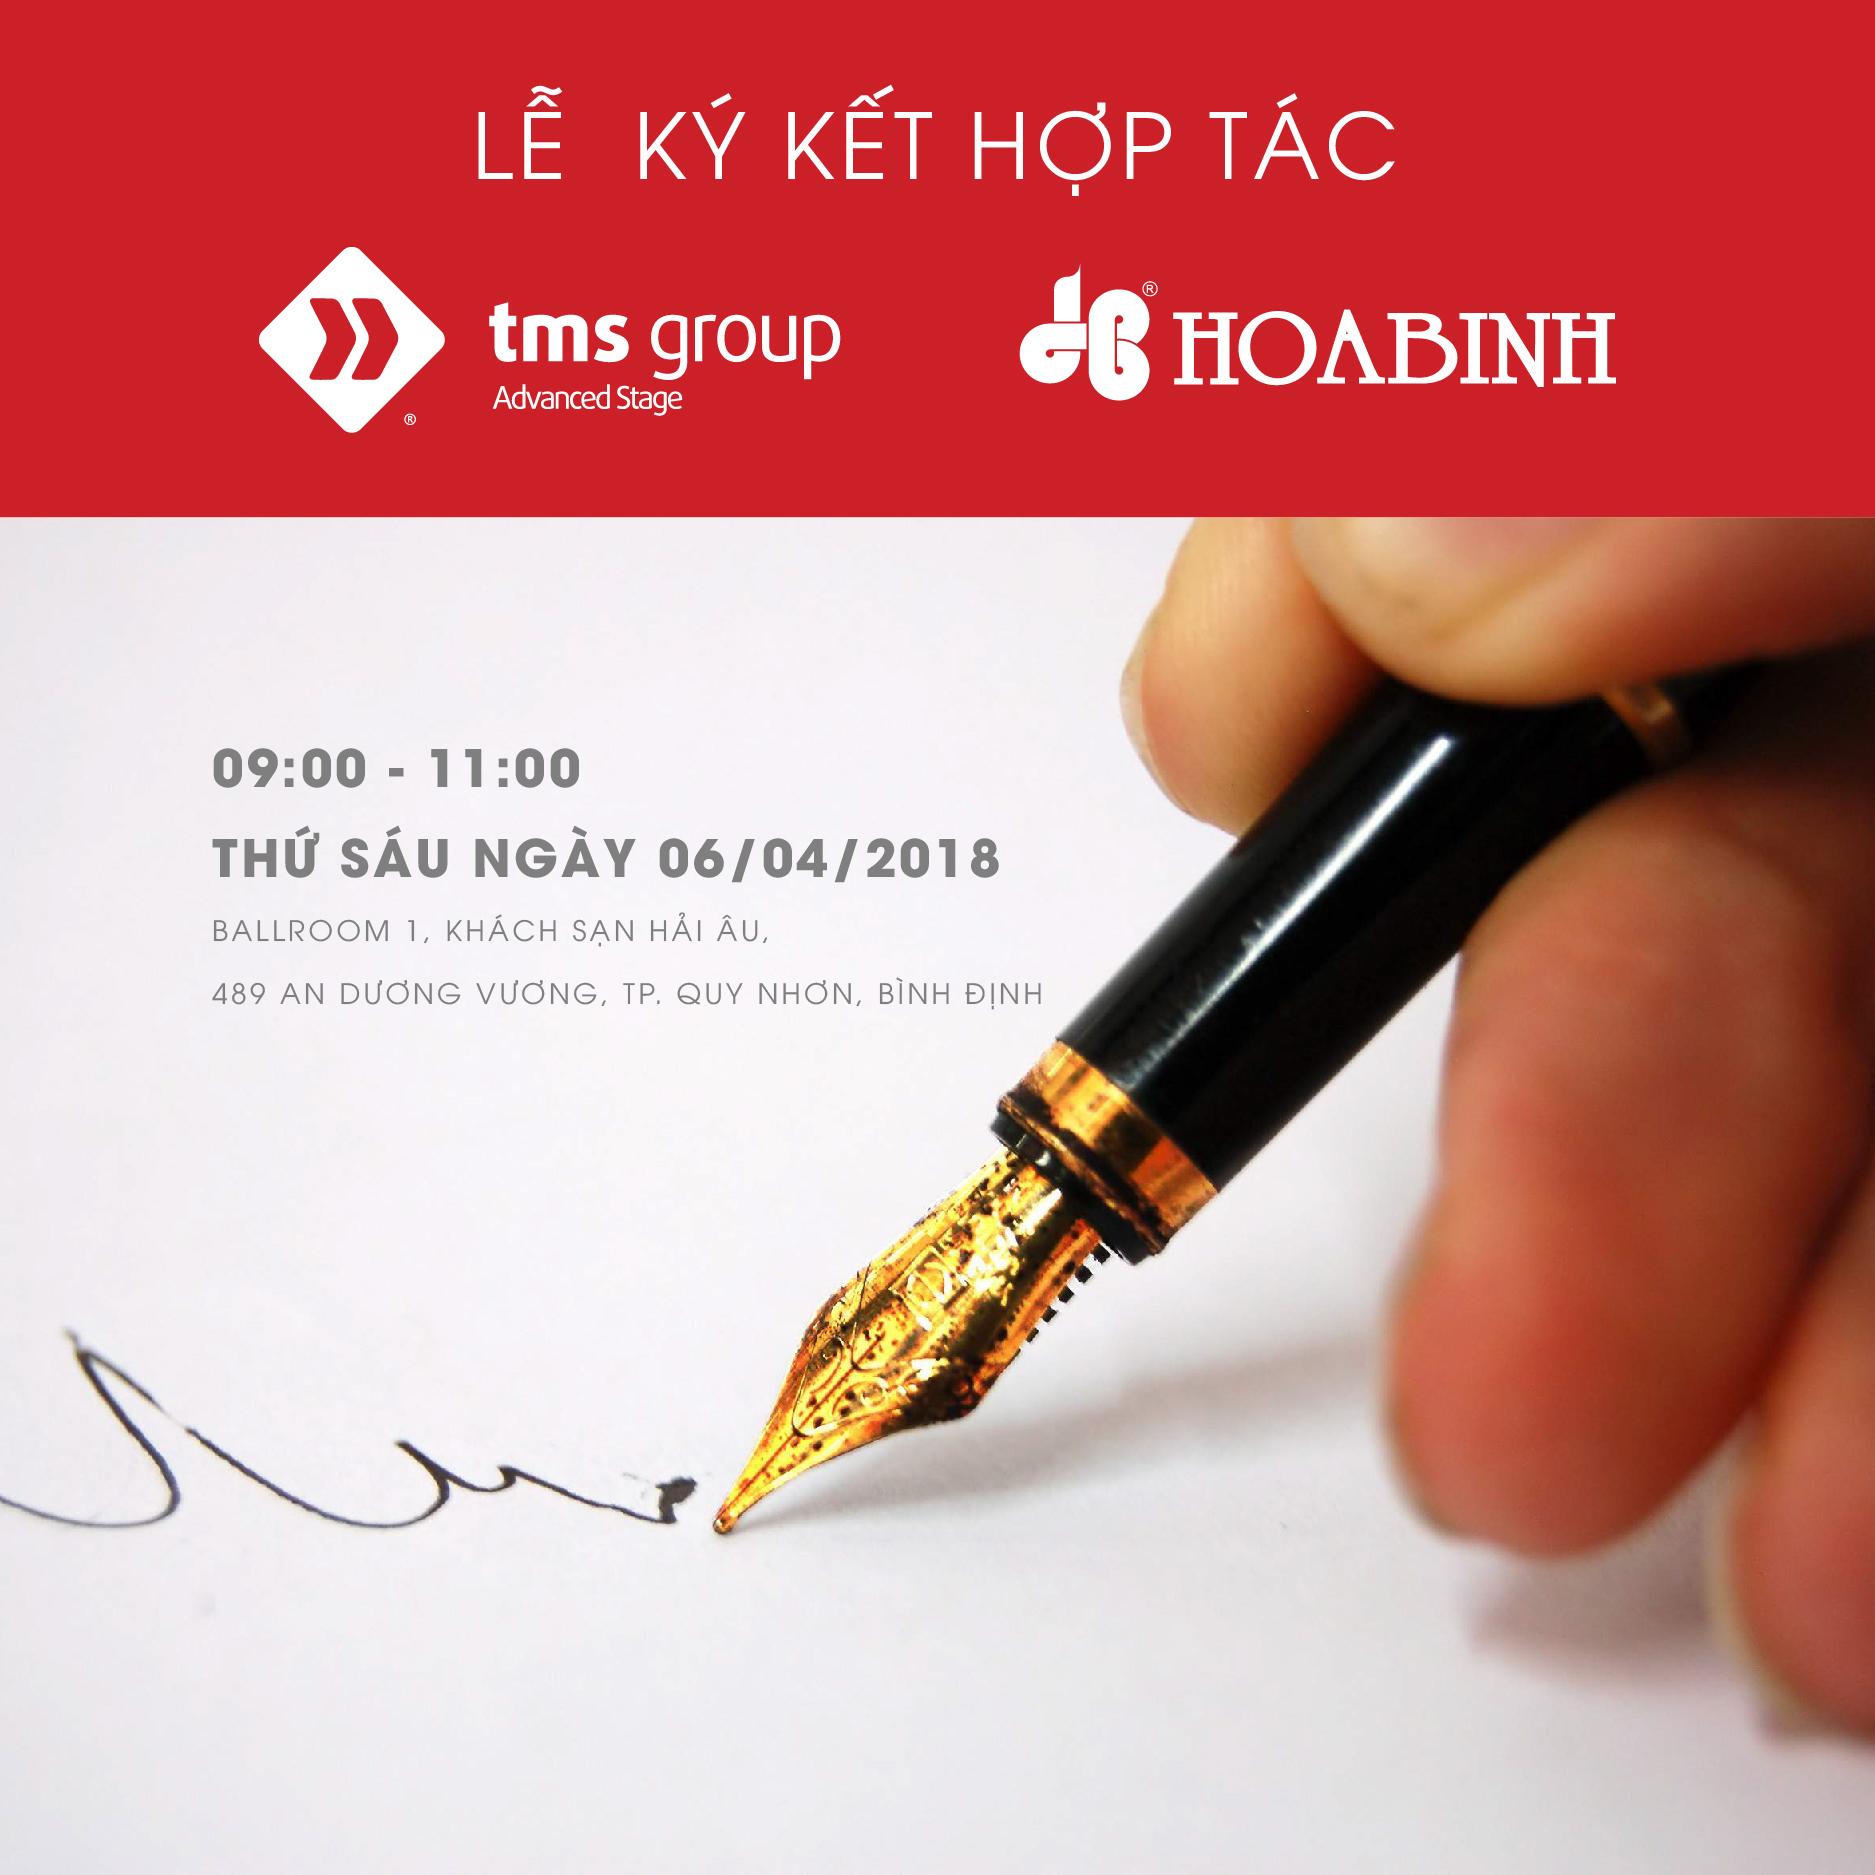 tms-group-ky-hop-tac-nha-thau-hoa-binh